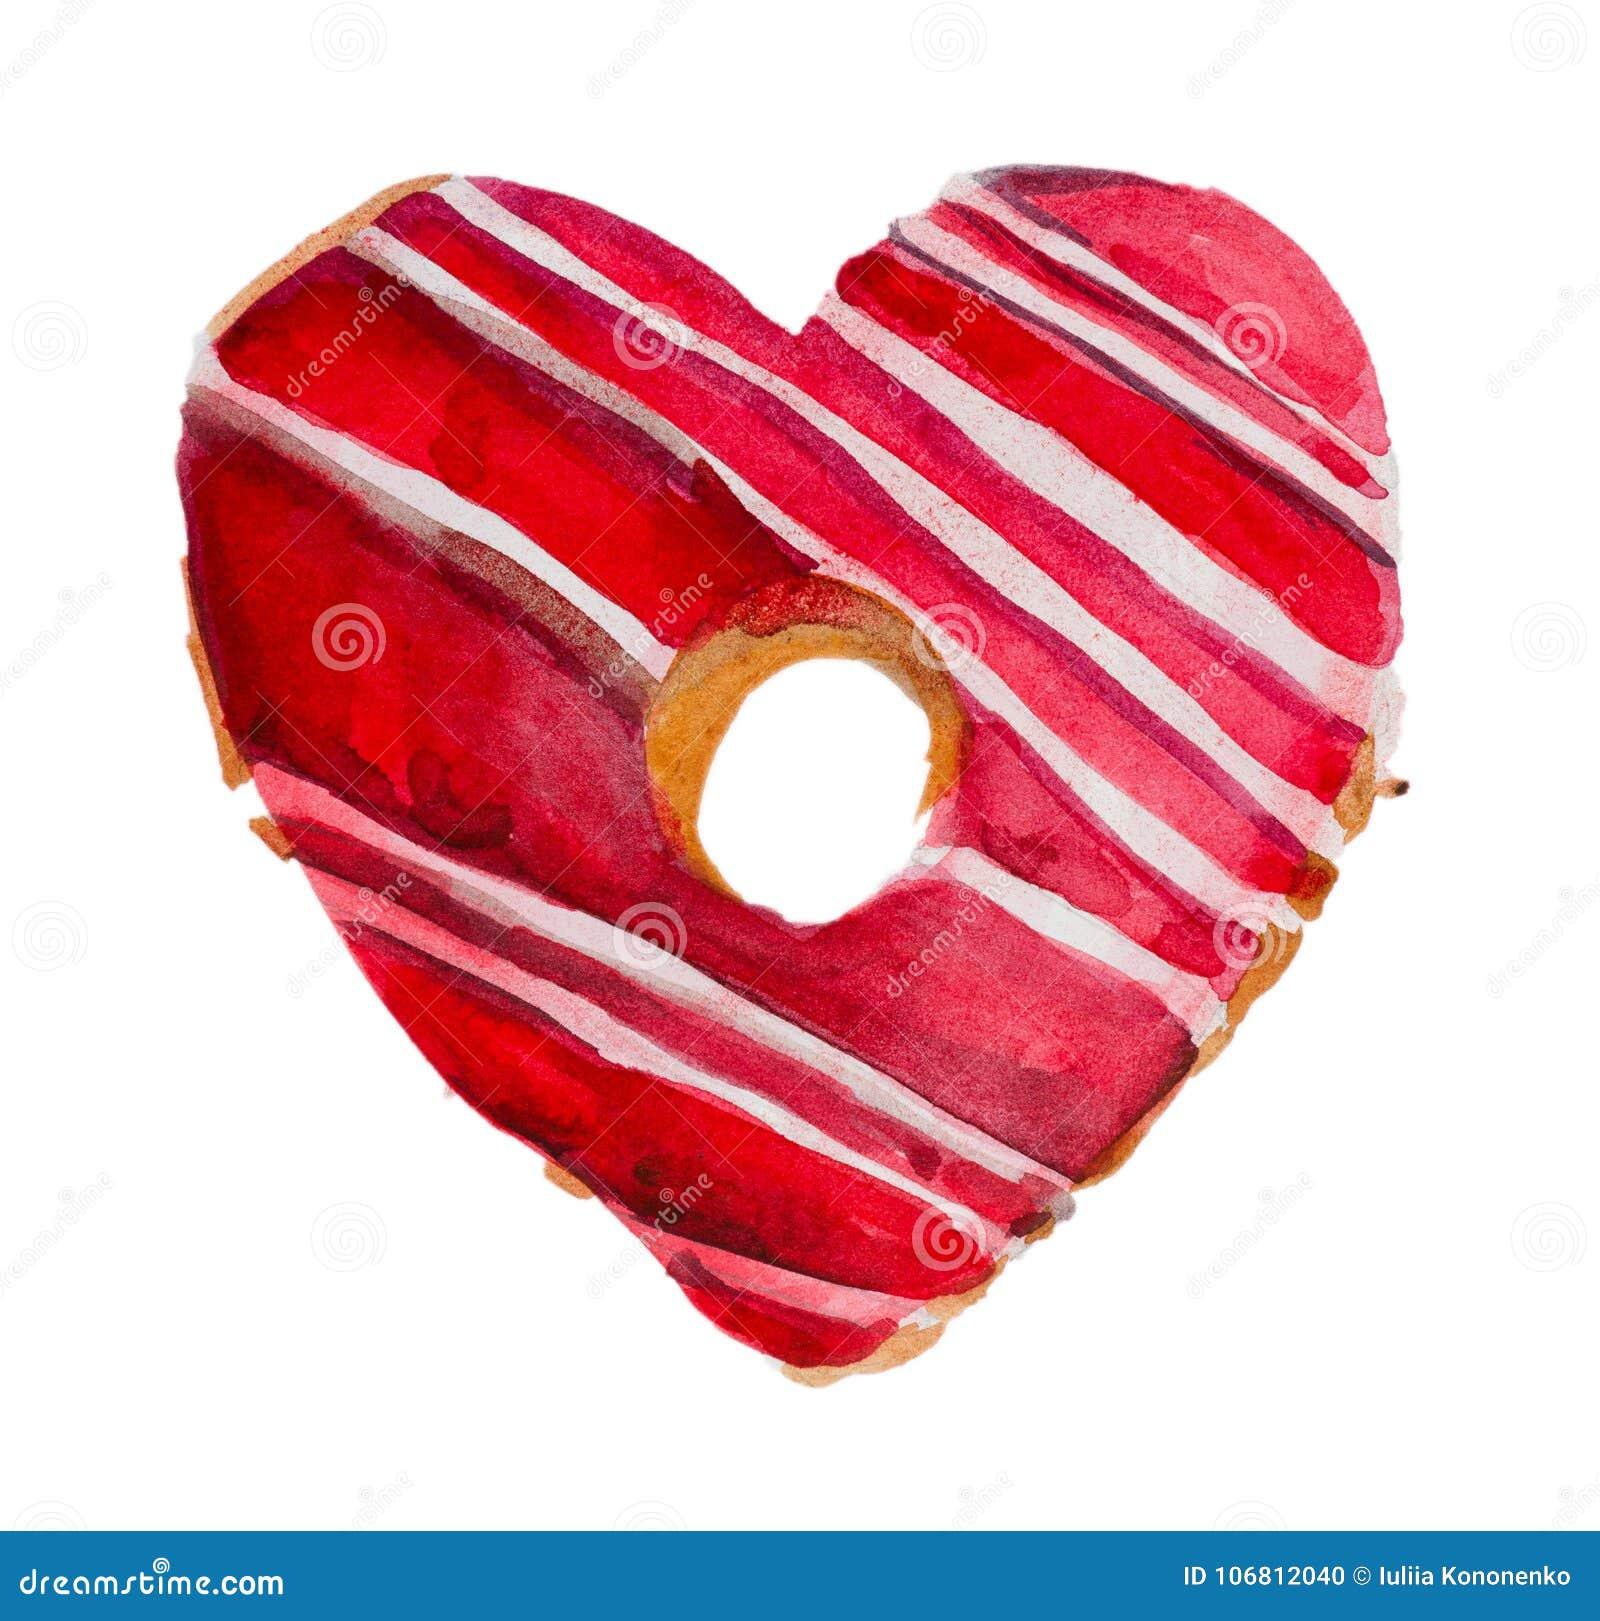 Aquarell-St.-Valentinsgruß ` s Tag `` süßer Valentinsgruß ``